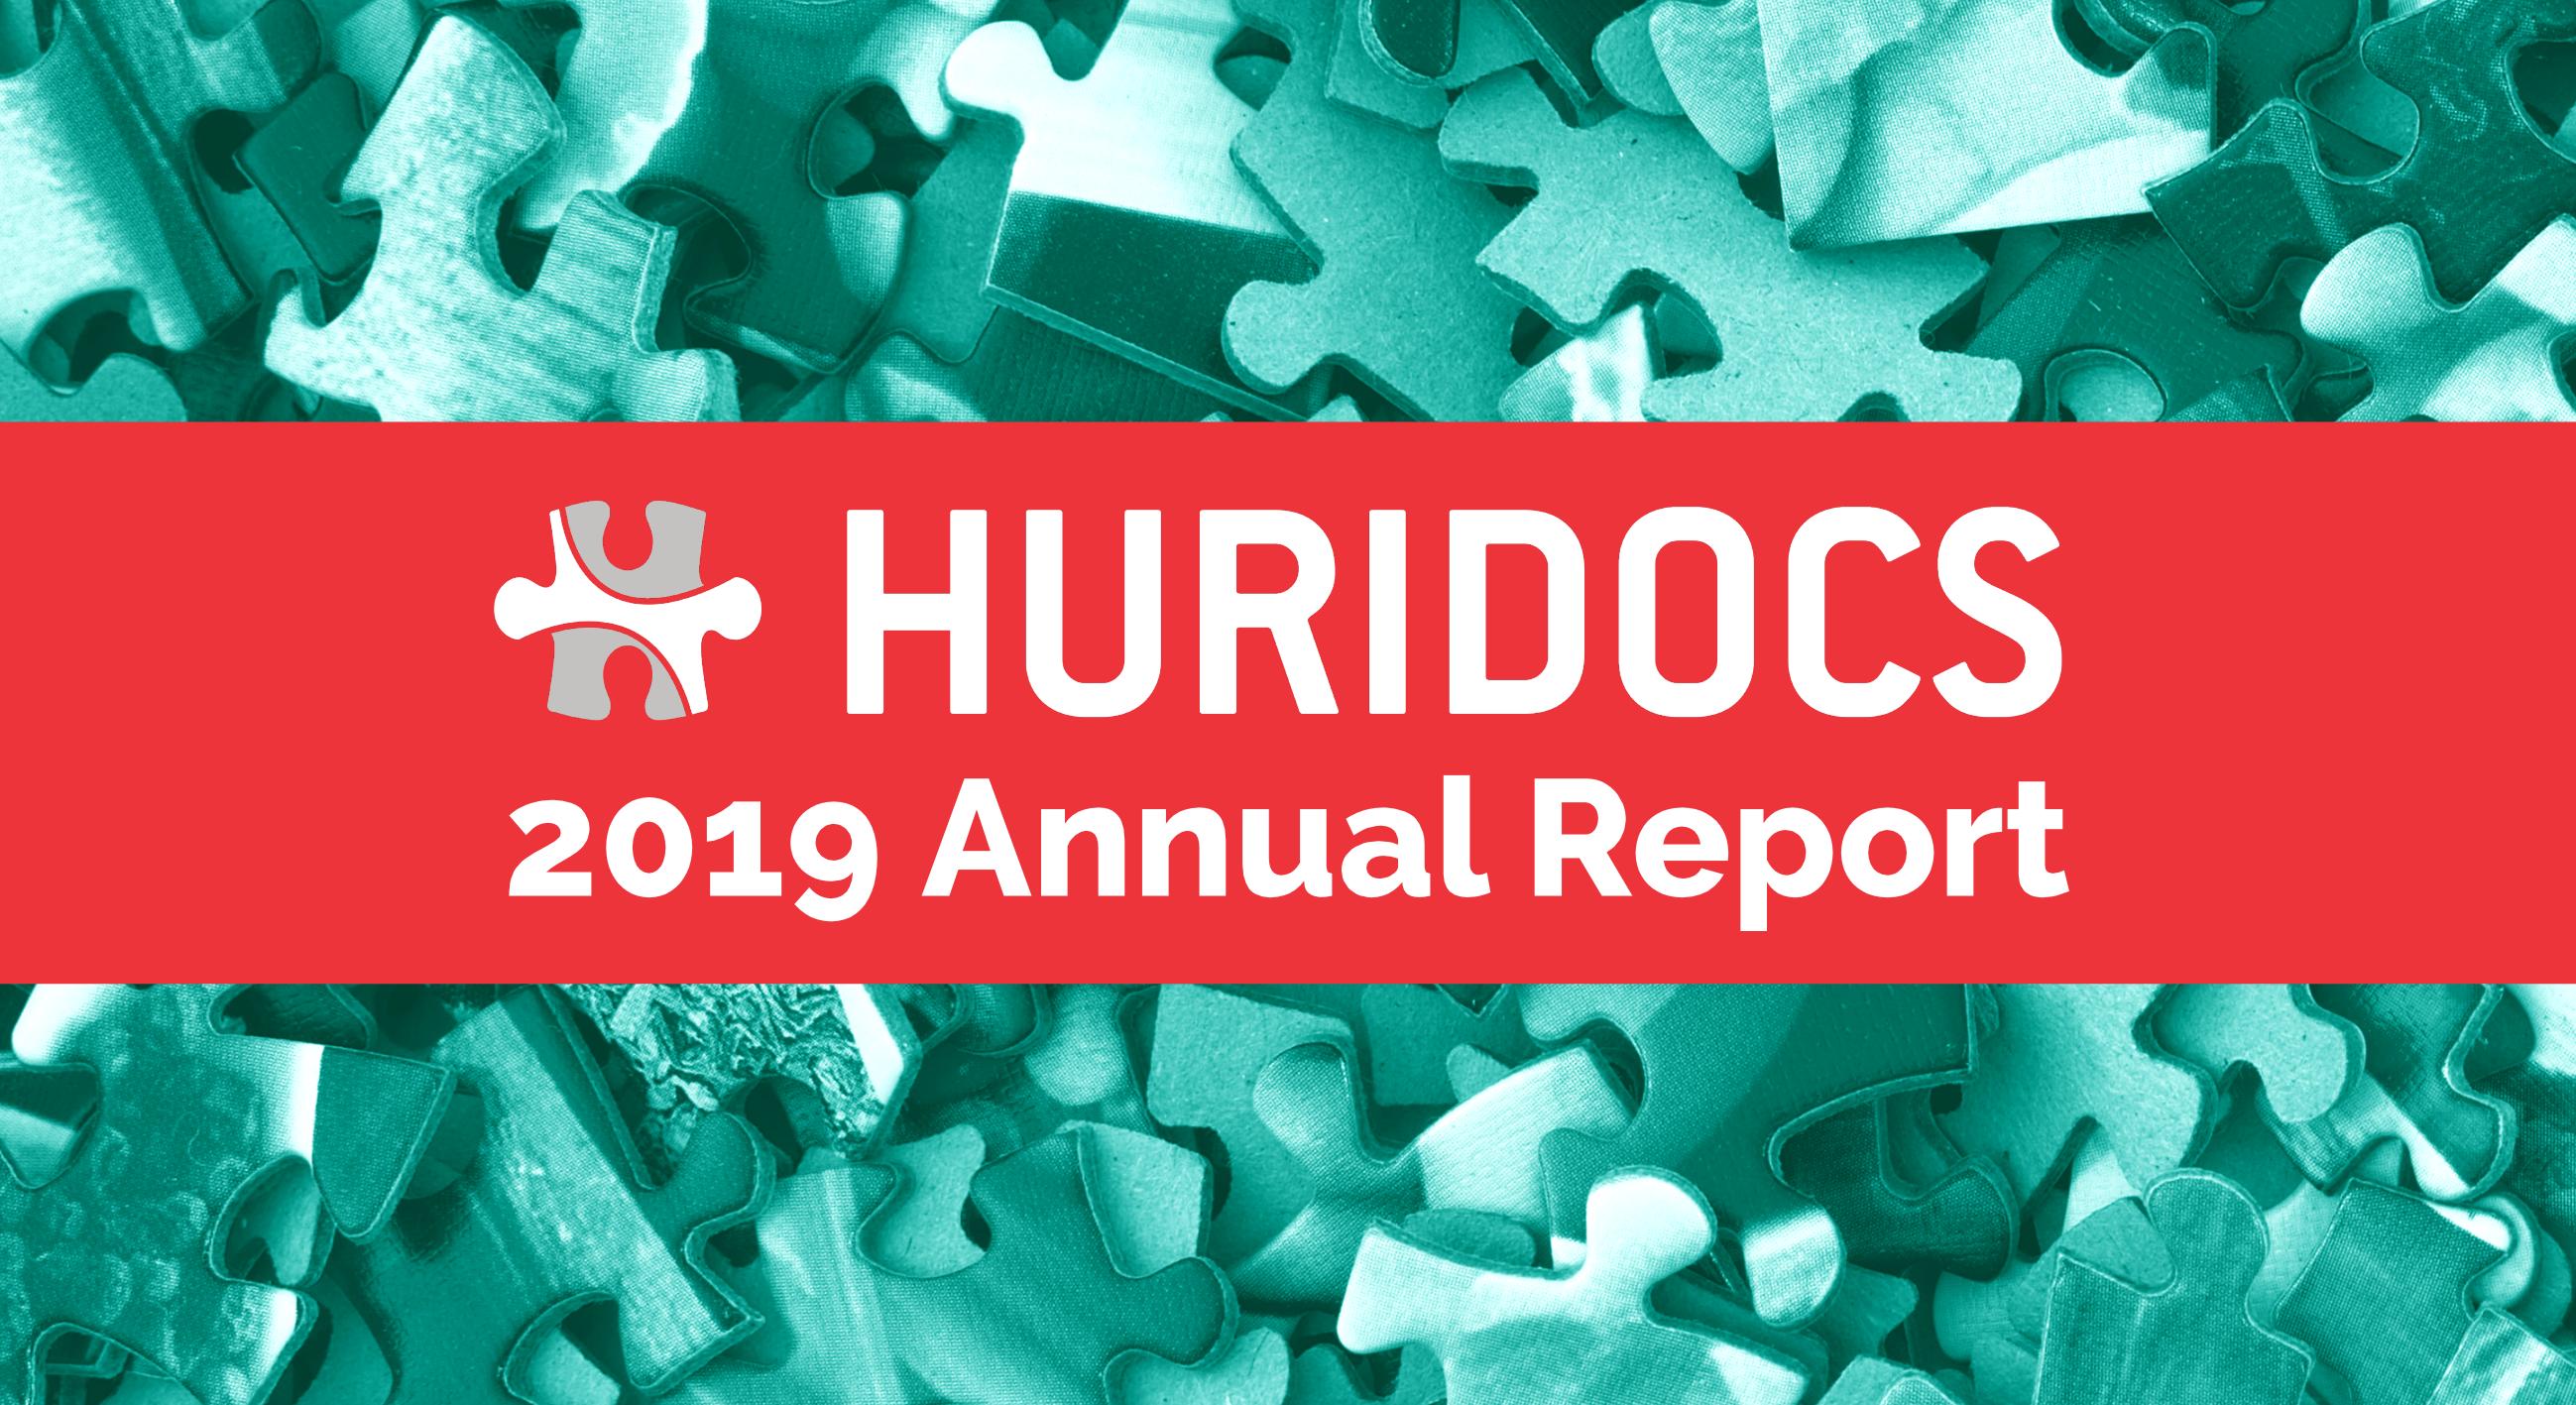 HURIDOCS 2019 Annual Report